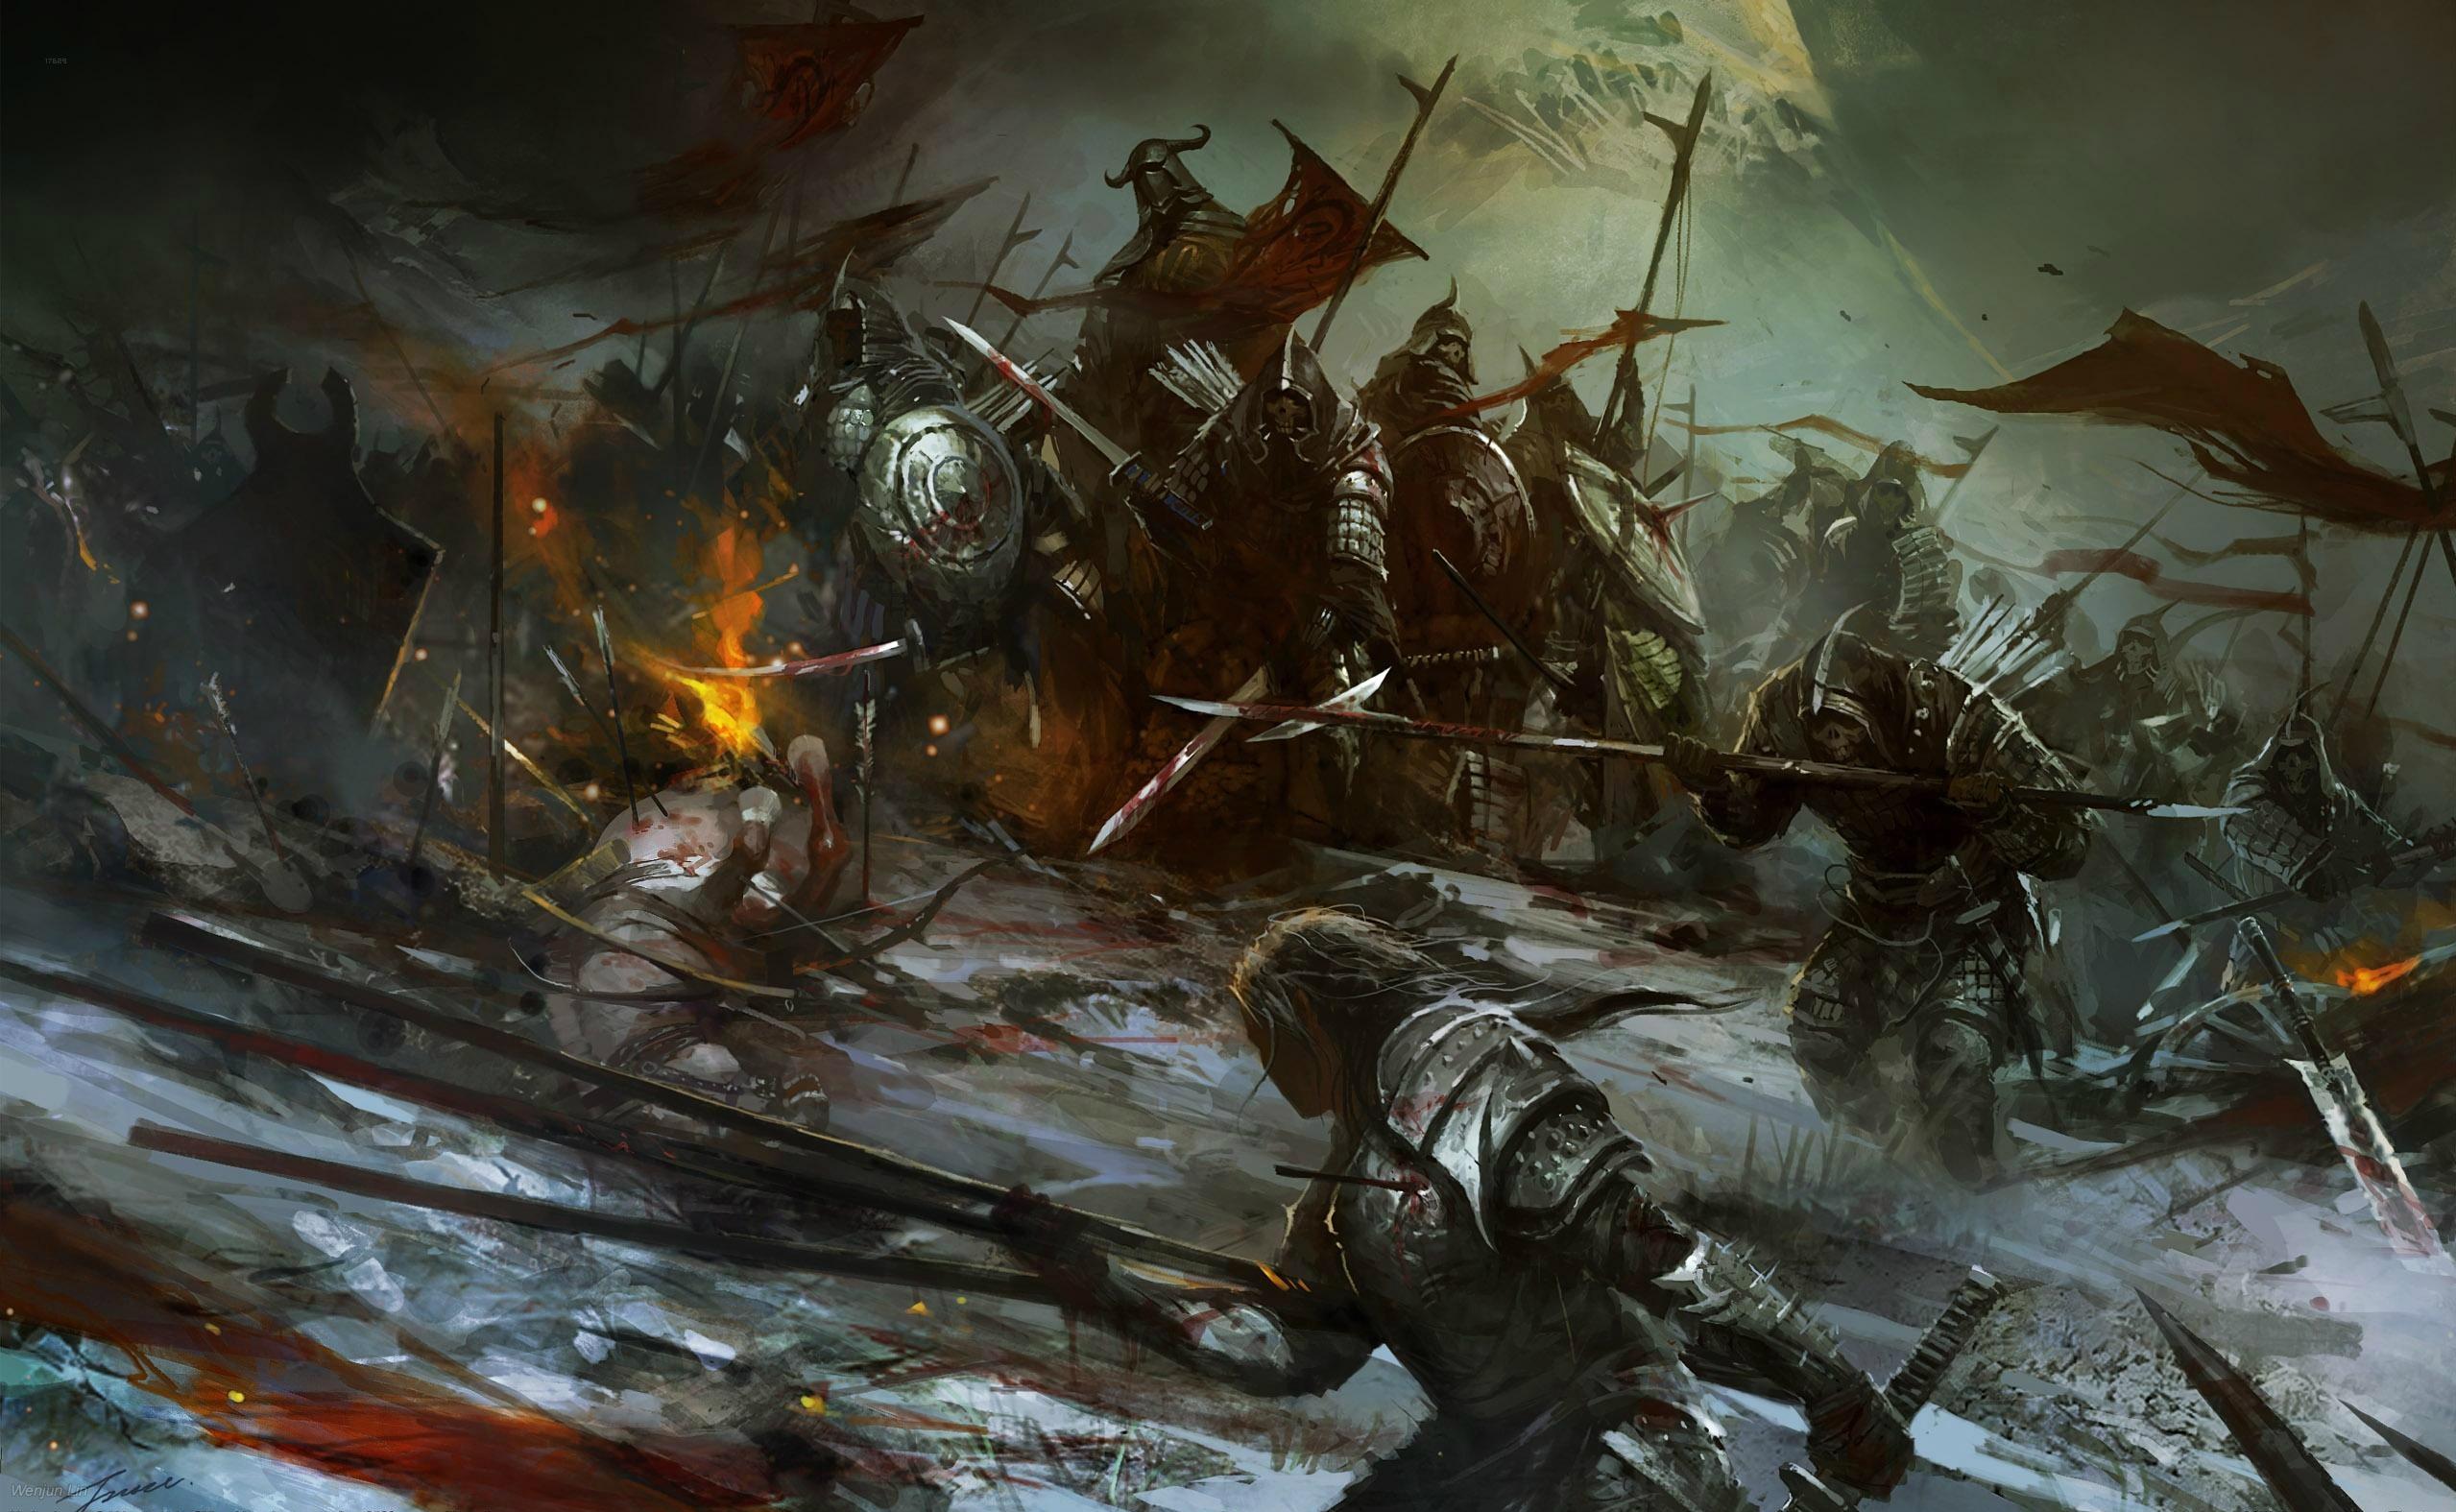 orc battle wallpaper background 2558x1575